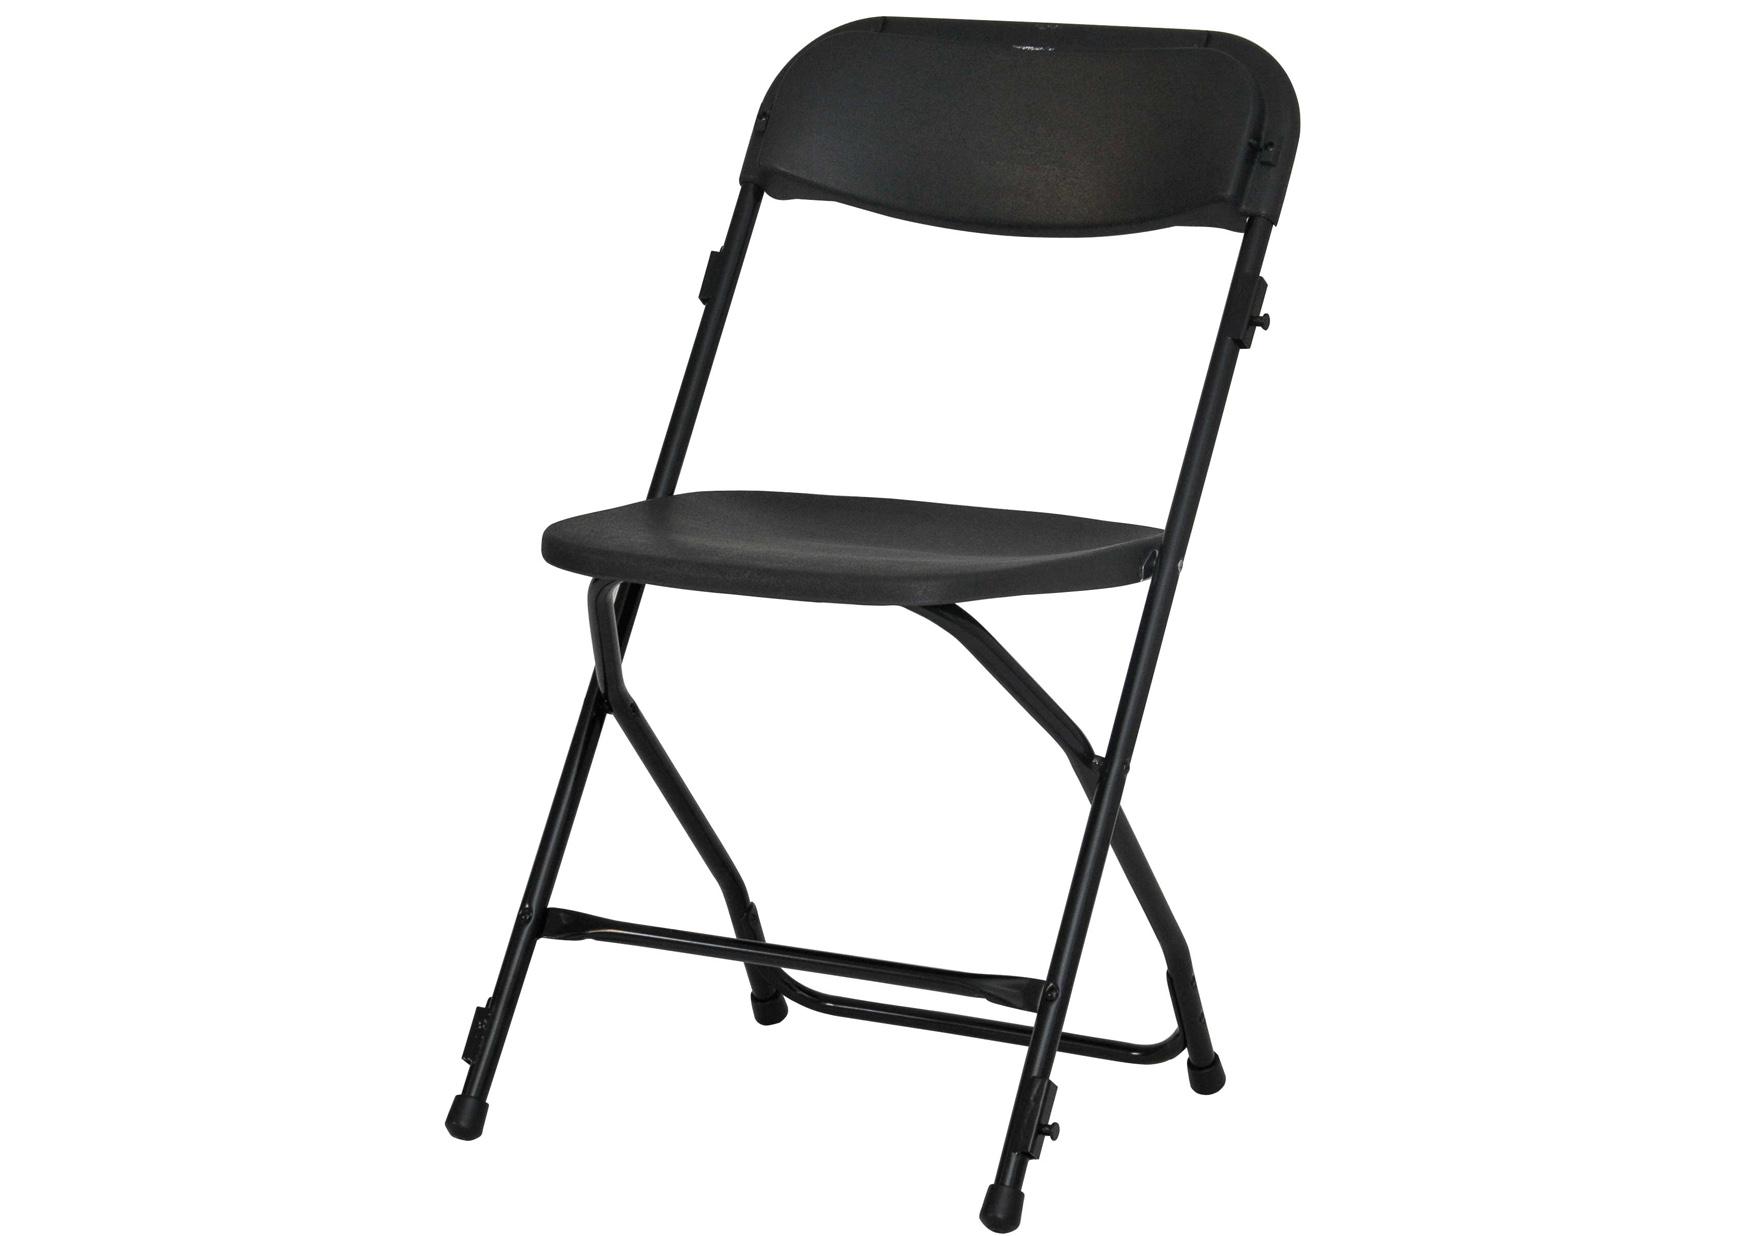 Silla plegable ligera acero plastico alex k gc 52k bb zown - Precio de sillas ...